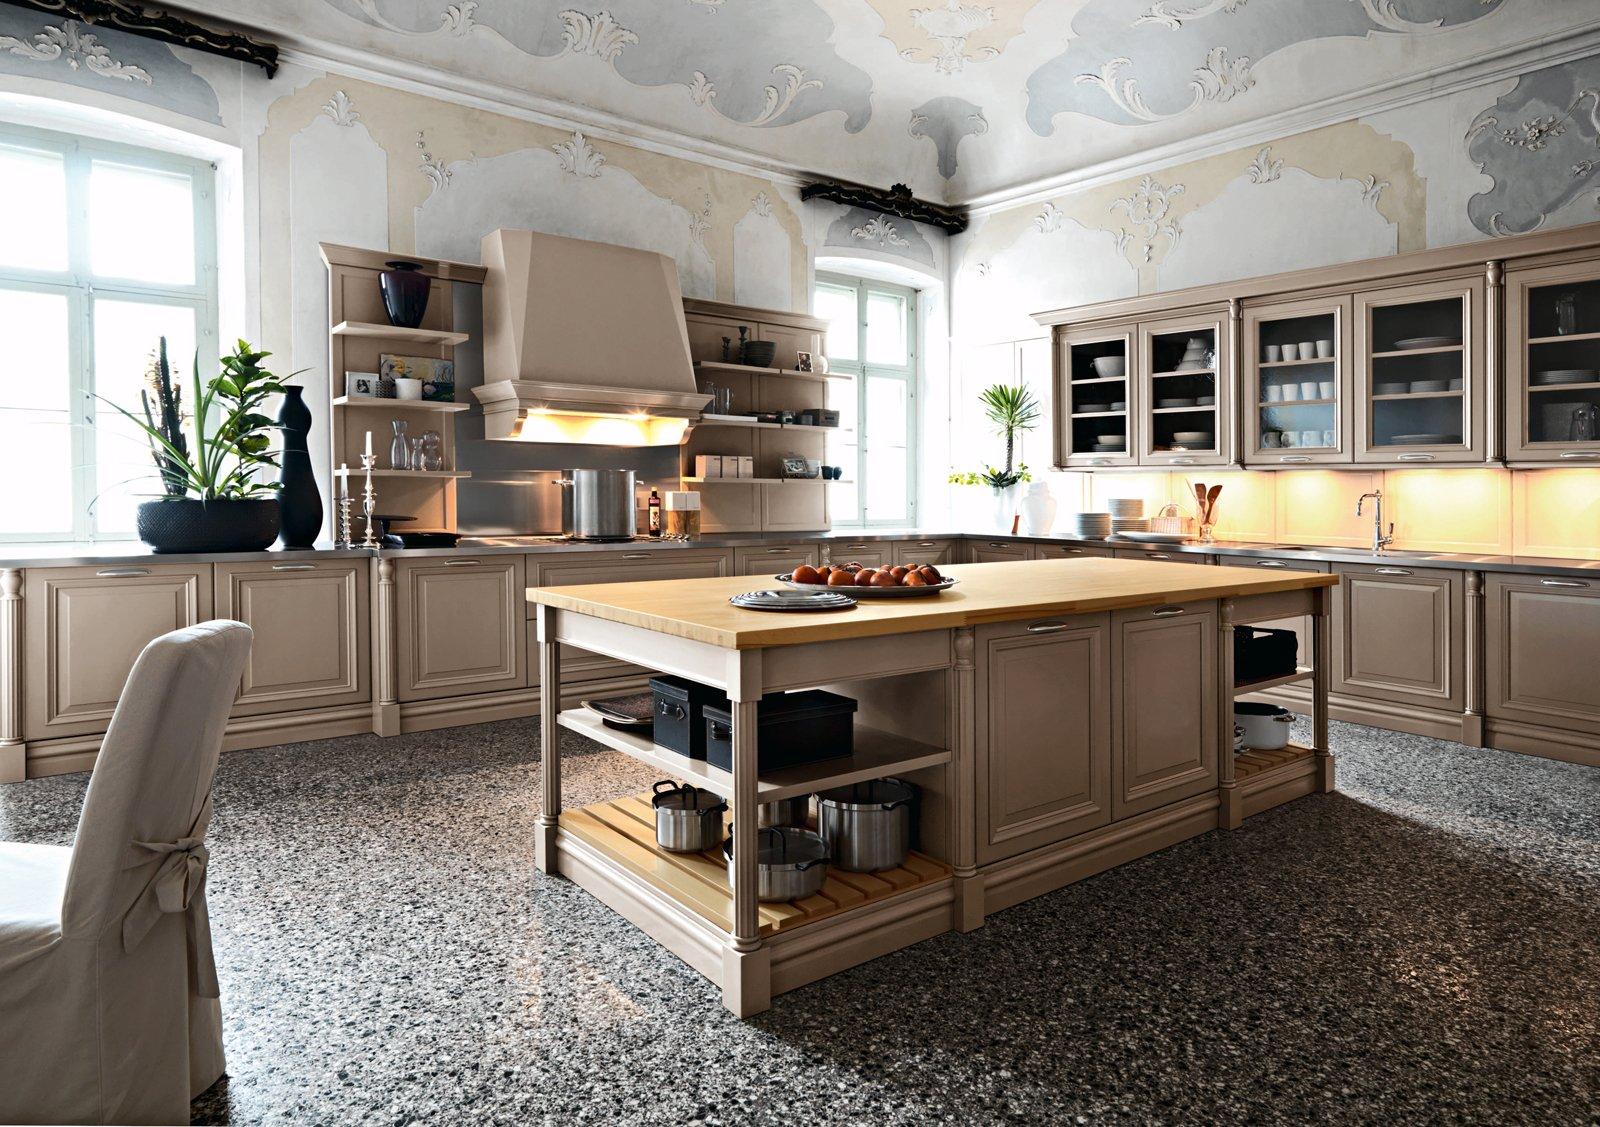 New Classic La Nuova Cucina Country è New Classic In Cucina Un Tocco #856D46 1600 1127 Parquet In Sala Da Pranzo